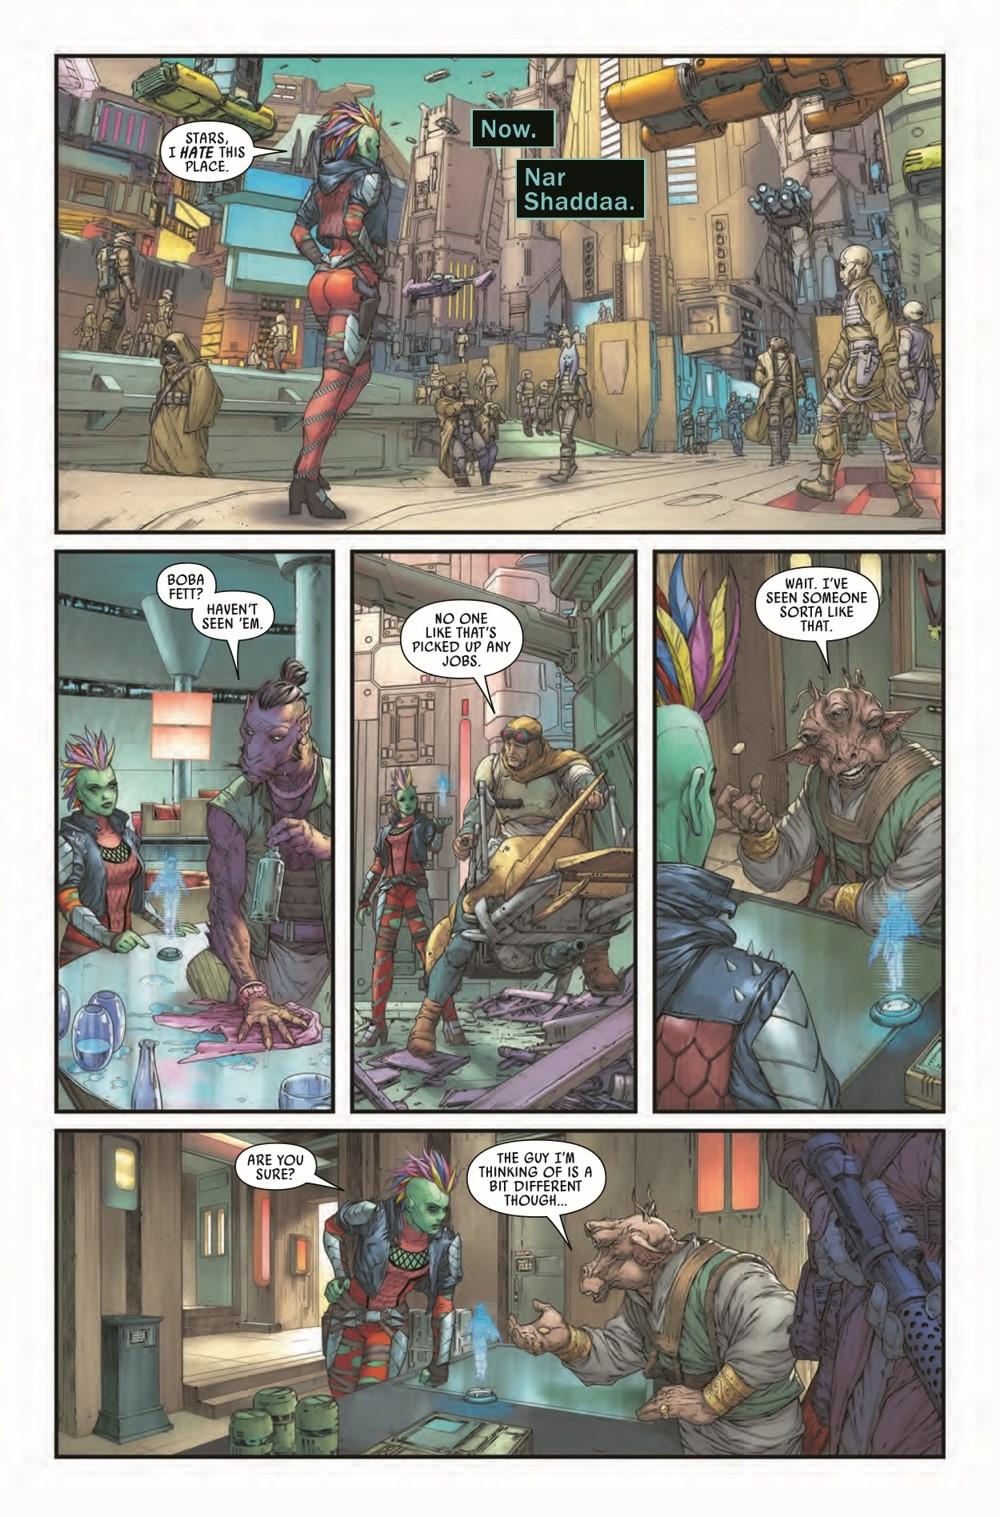 STWWAROTBHJABBAT2021001_Preview-7 ComicList Previews: STAR WARS WAR OF THE BOUNTY HUNTERS JABBA THE HUTT #1